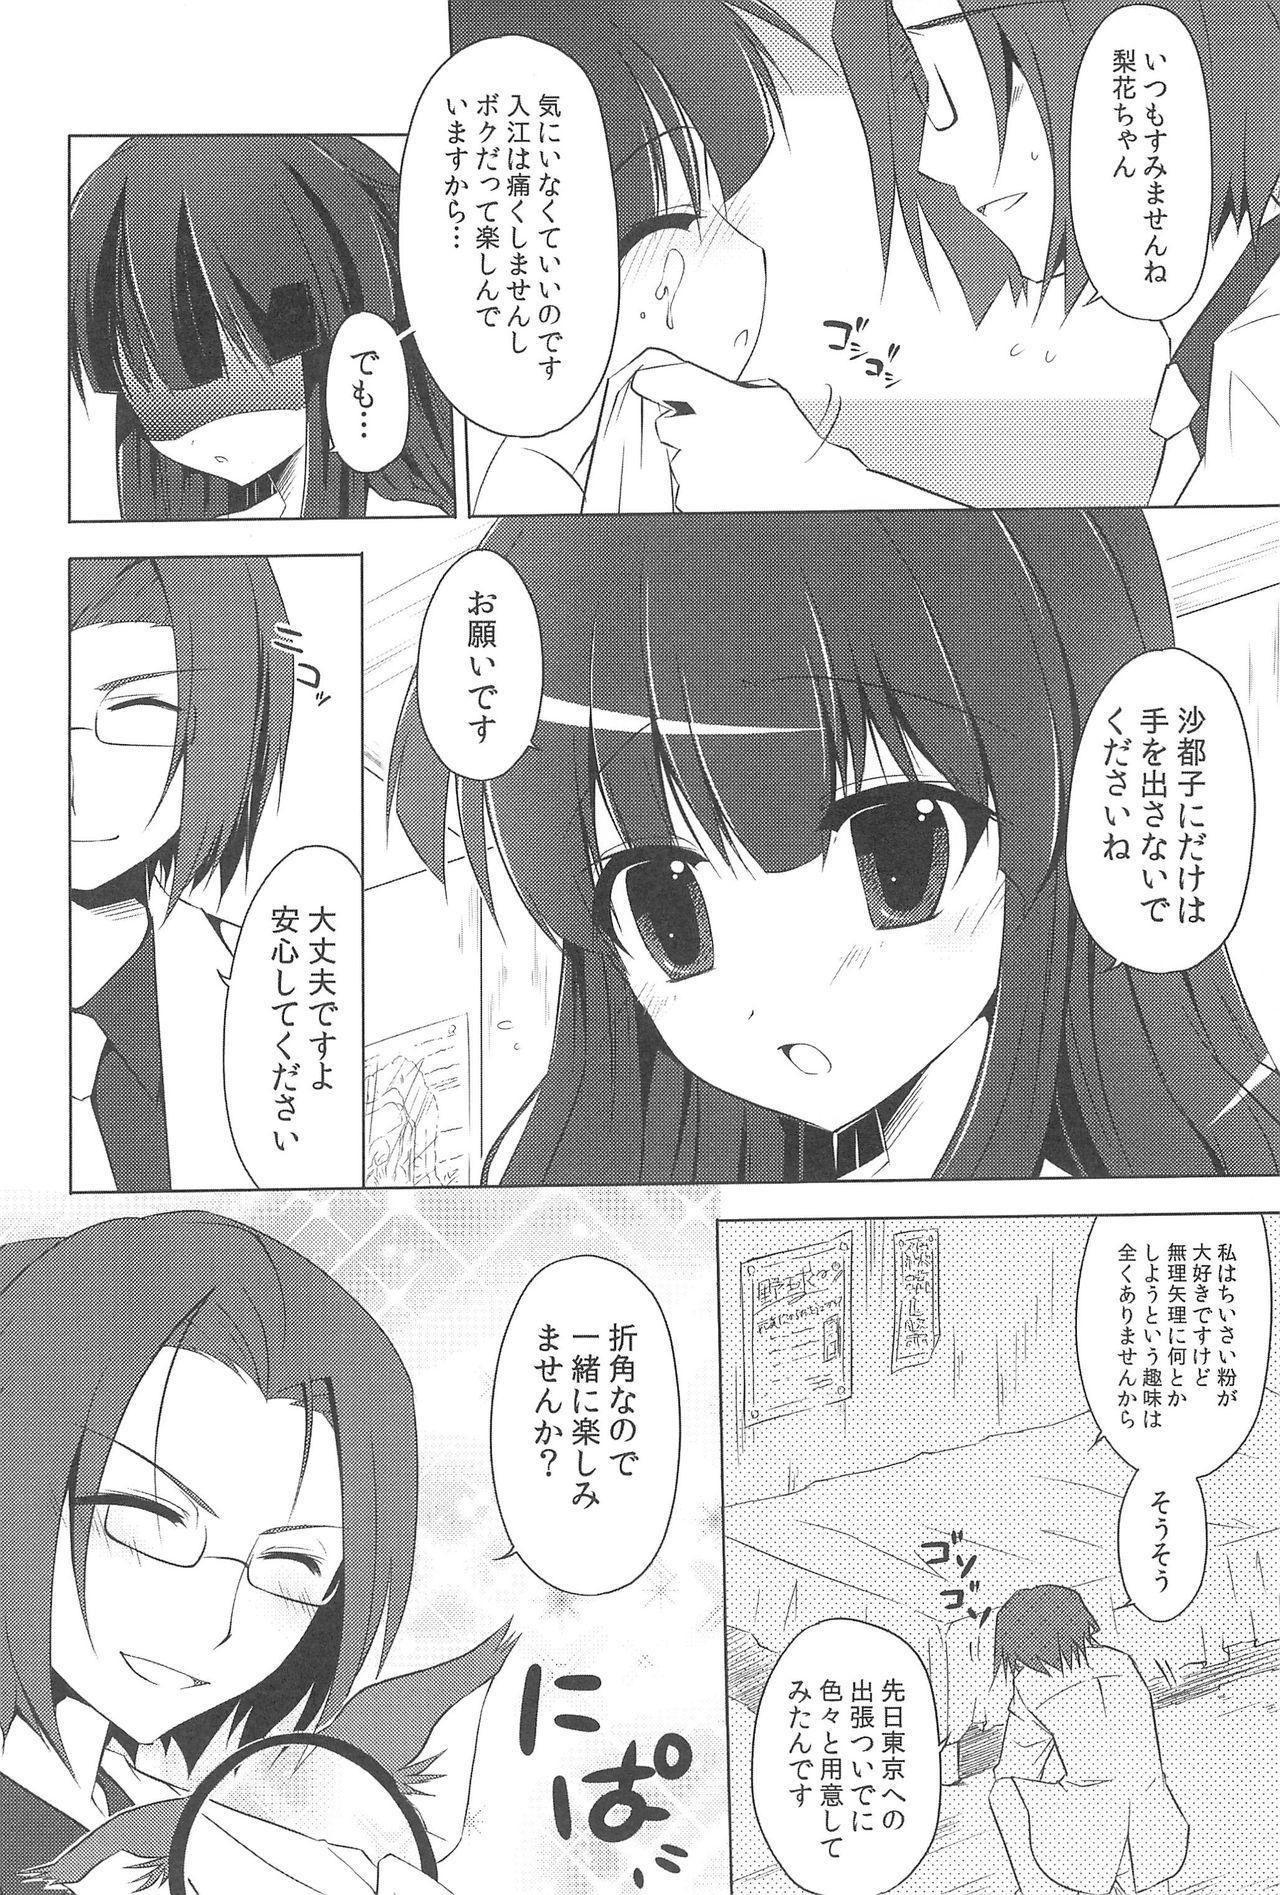 Rika-chan to Issho 5